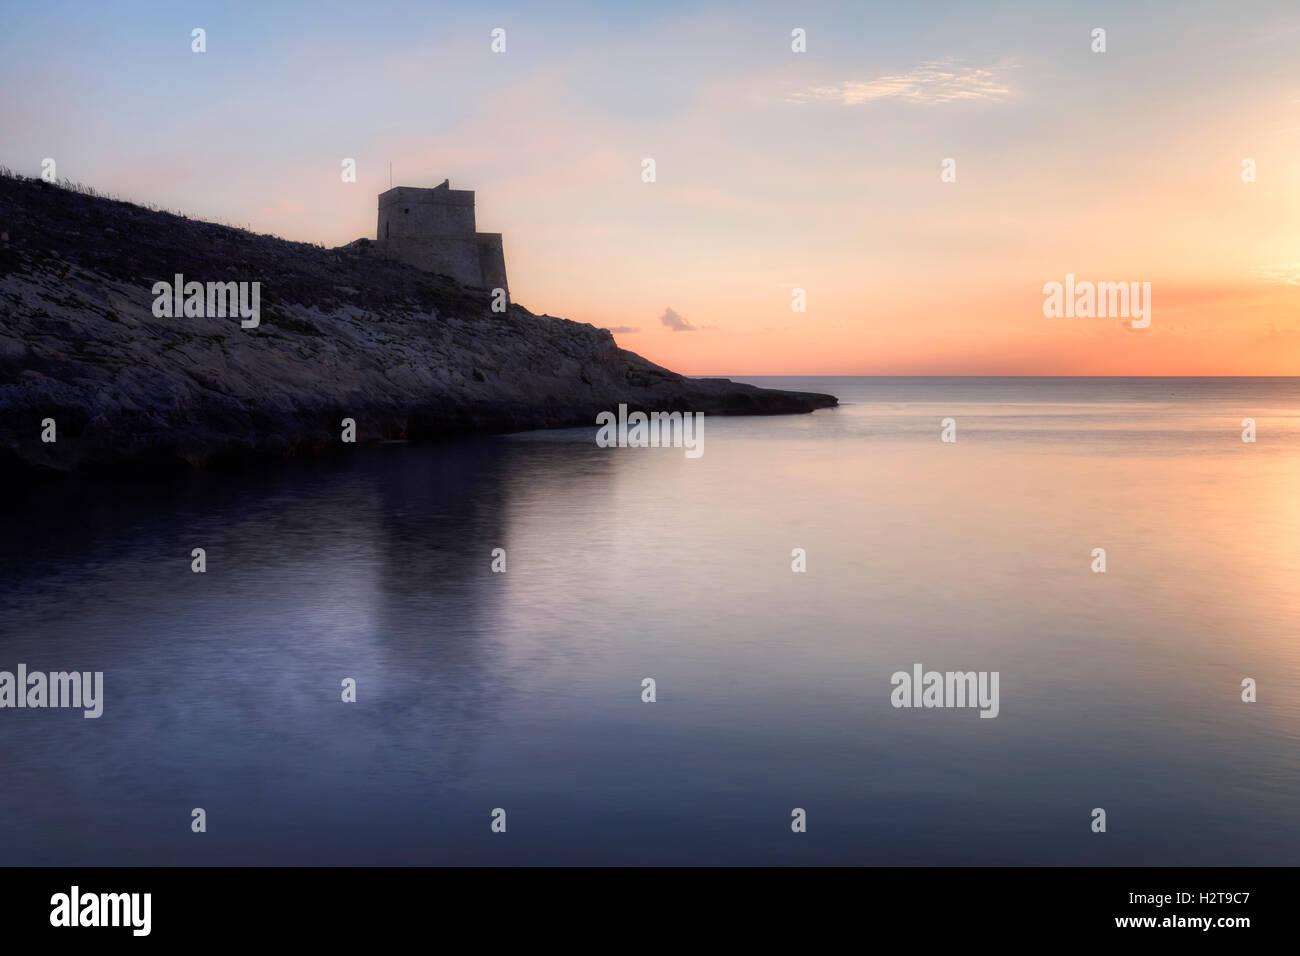 Baia di Xlendi, Torre di Xlendi, Gozo, Malta Immagini Stock